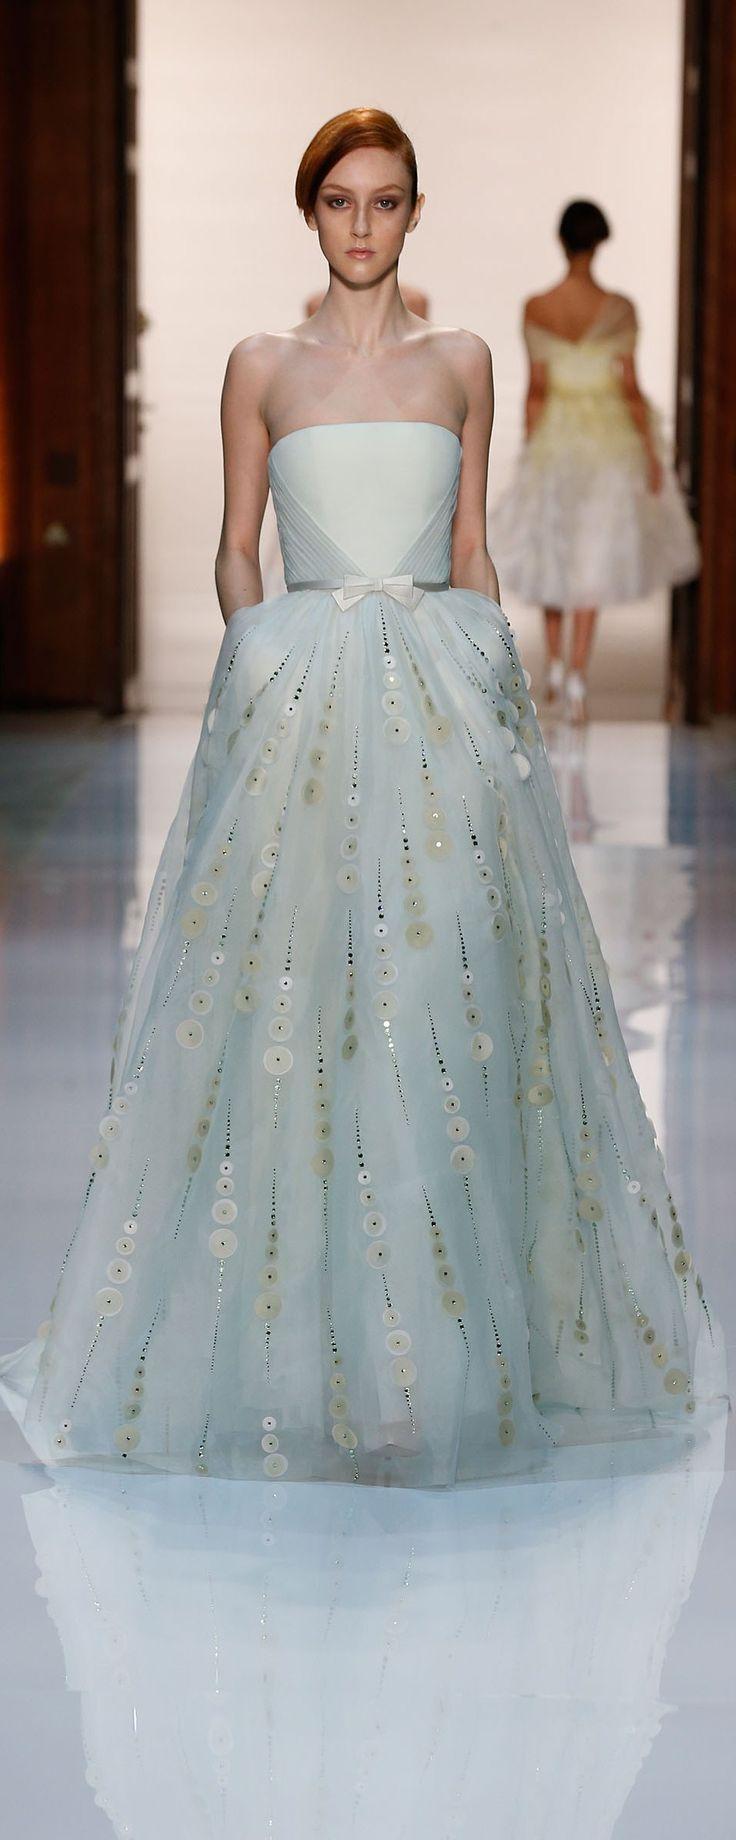 1795 best Mode images on Pinterest   Formal prom dresses, Sweet ...